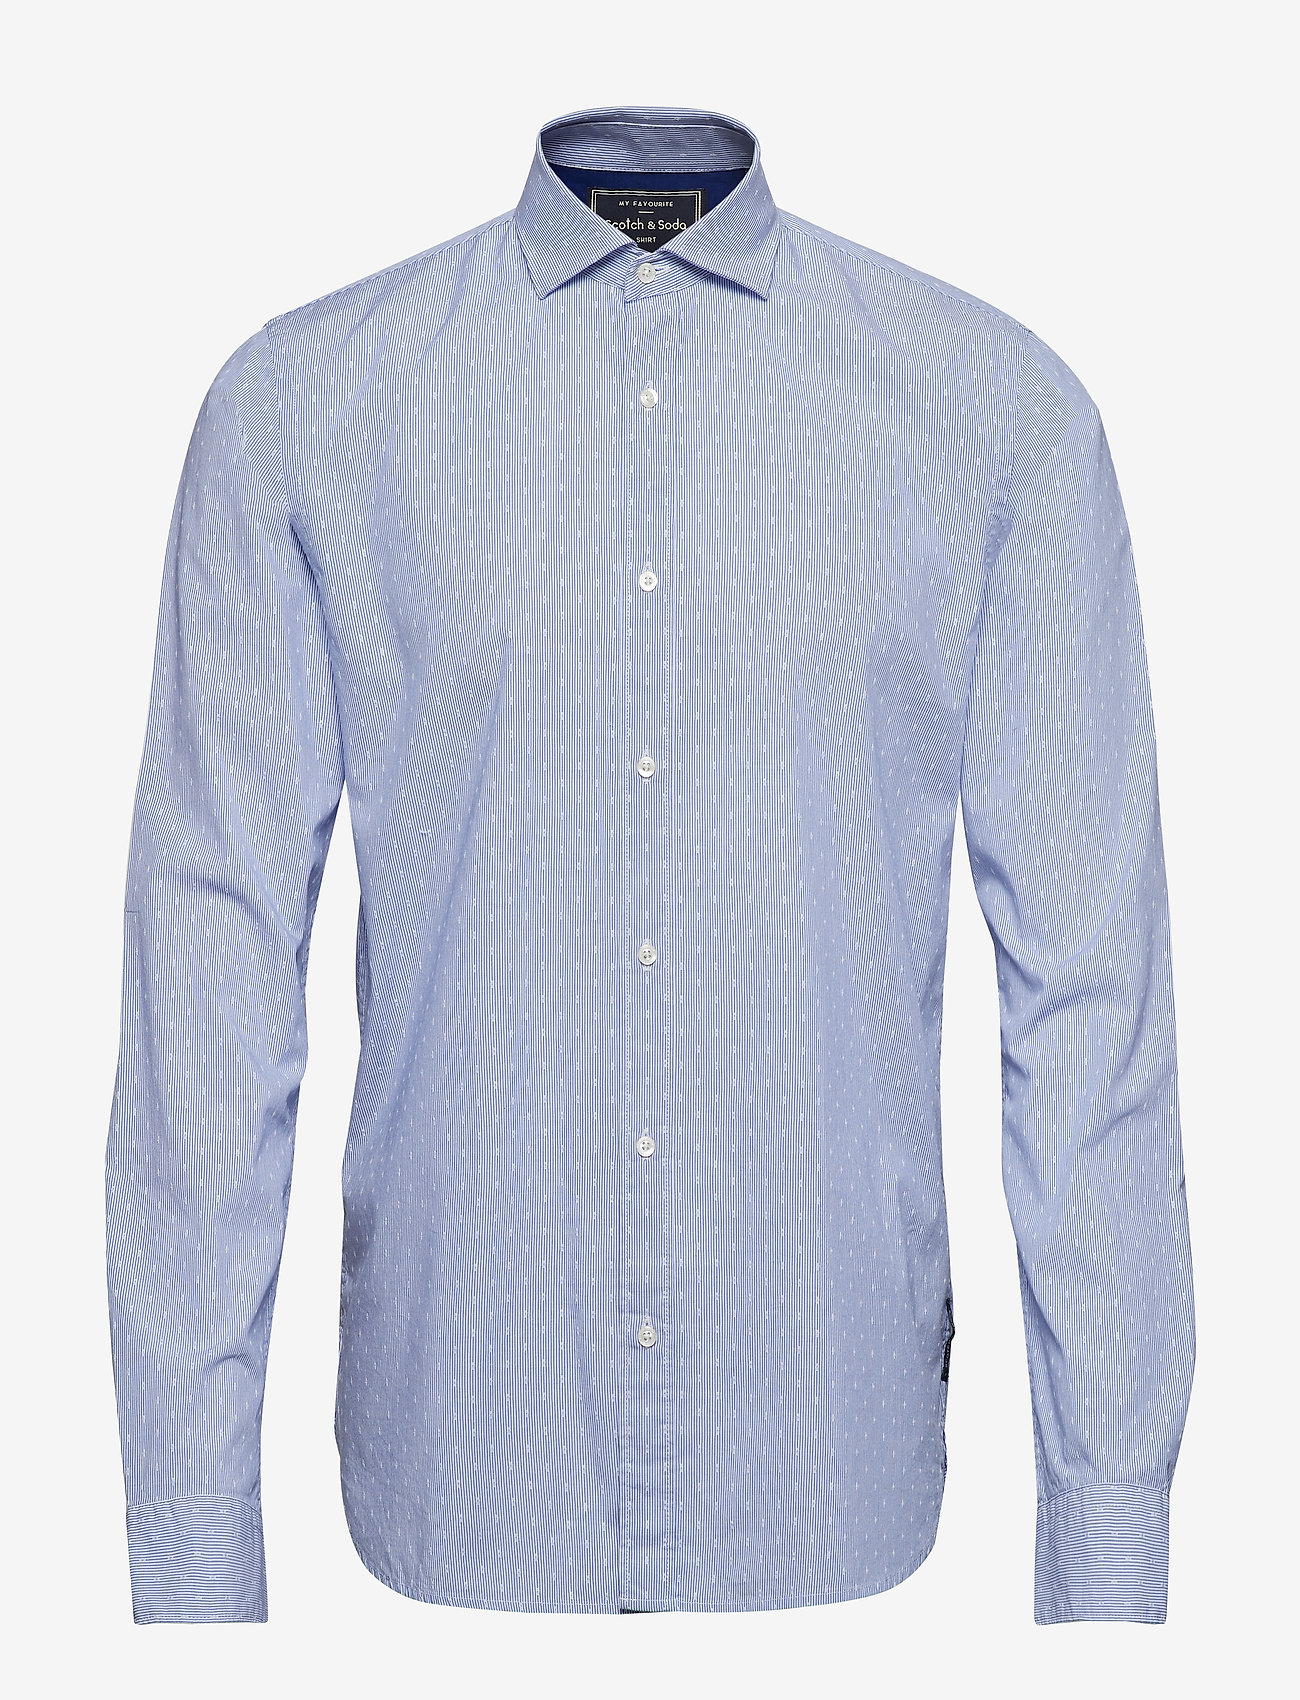 Scotch & Soda - REGULAR FIT- Classic dress shirt in blue - chemises d'affaires - combo d - 0